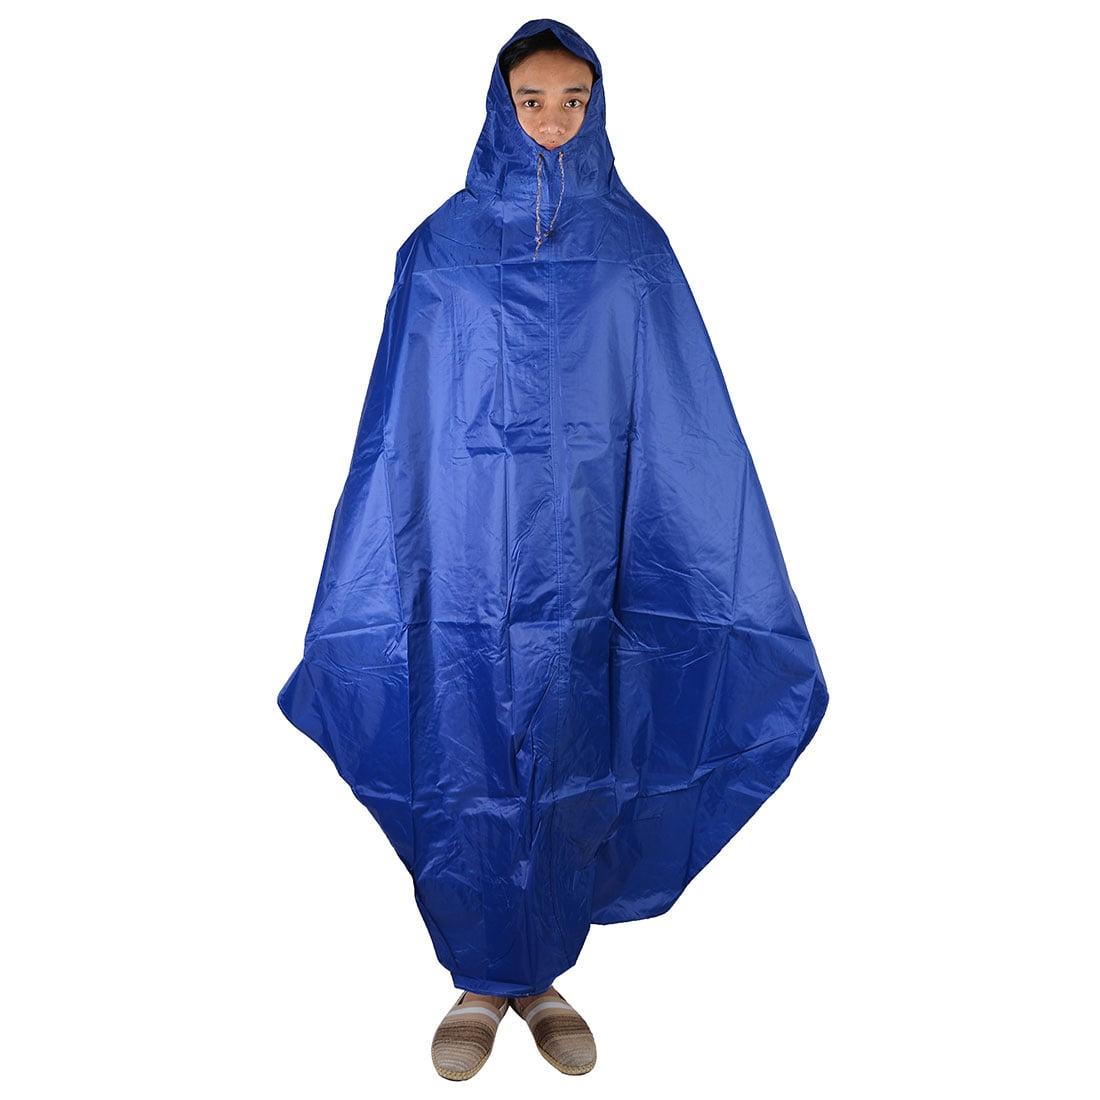 Unisex Cycling Bike Bicycle Outdoor Rain Water Resistant Hooded Raincoat